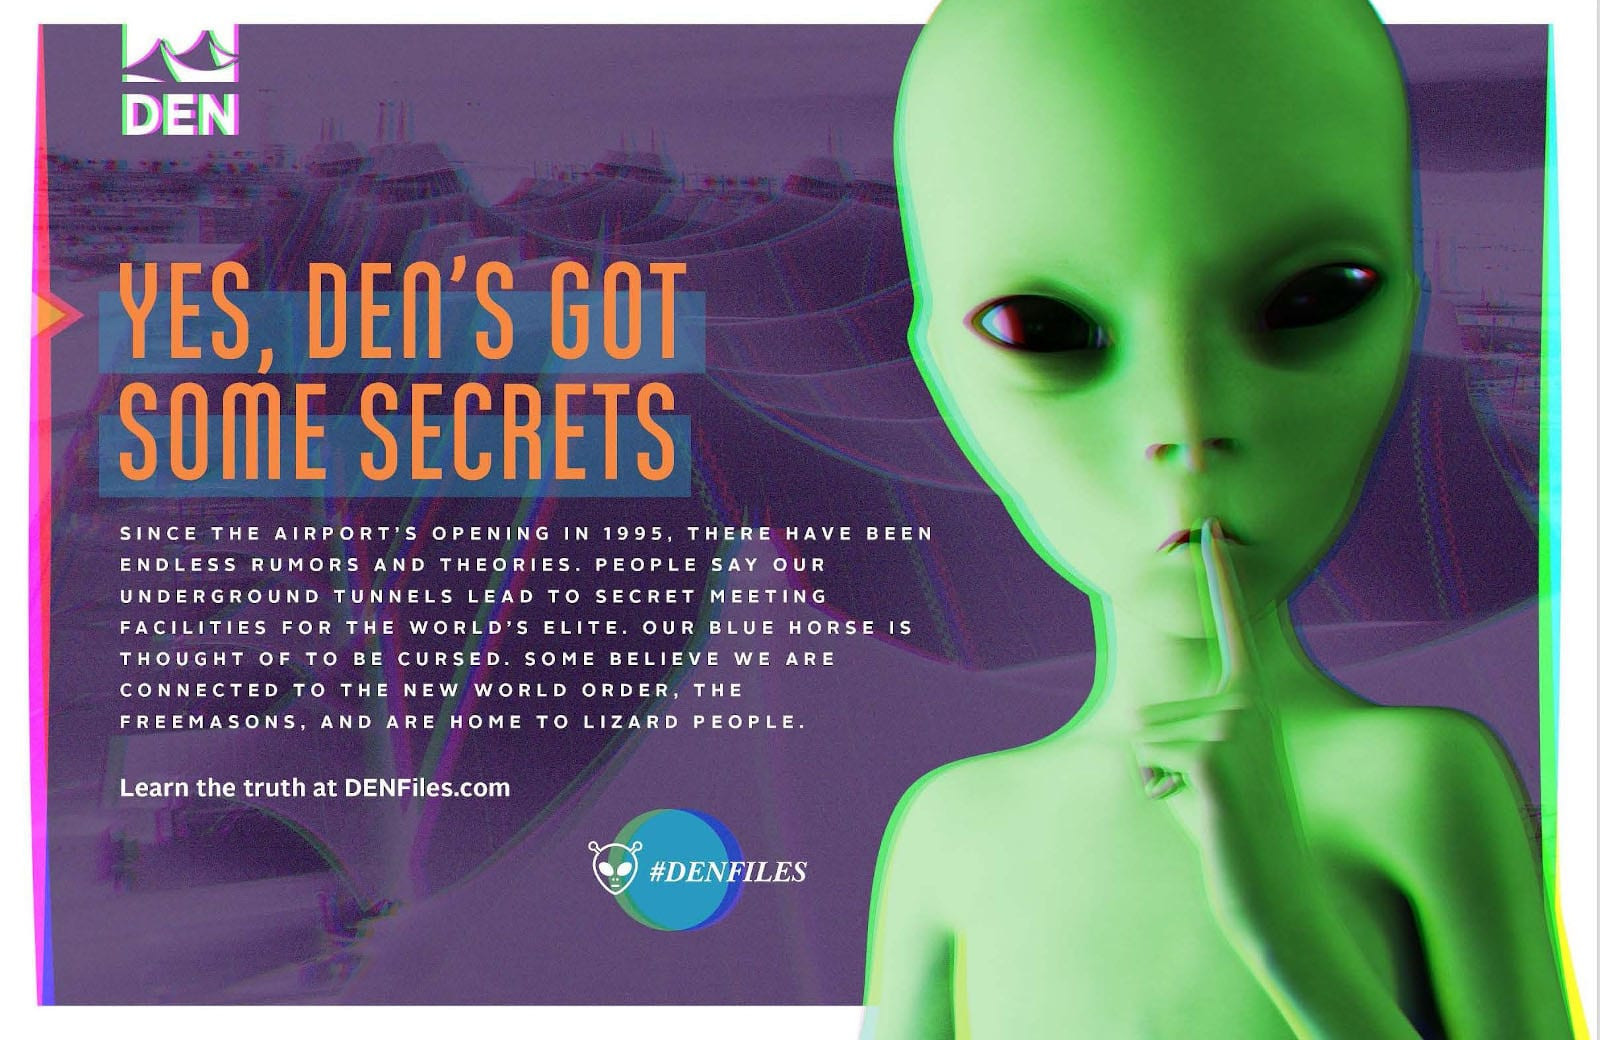 DIA Conspiracy Theories Alien Denver Airport Art